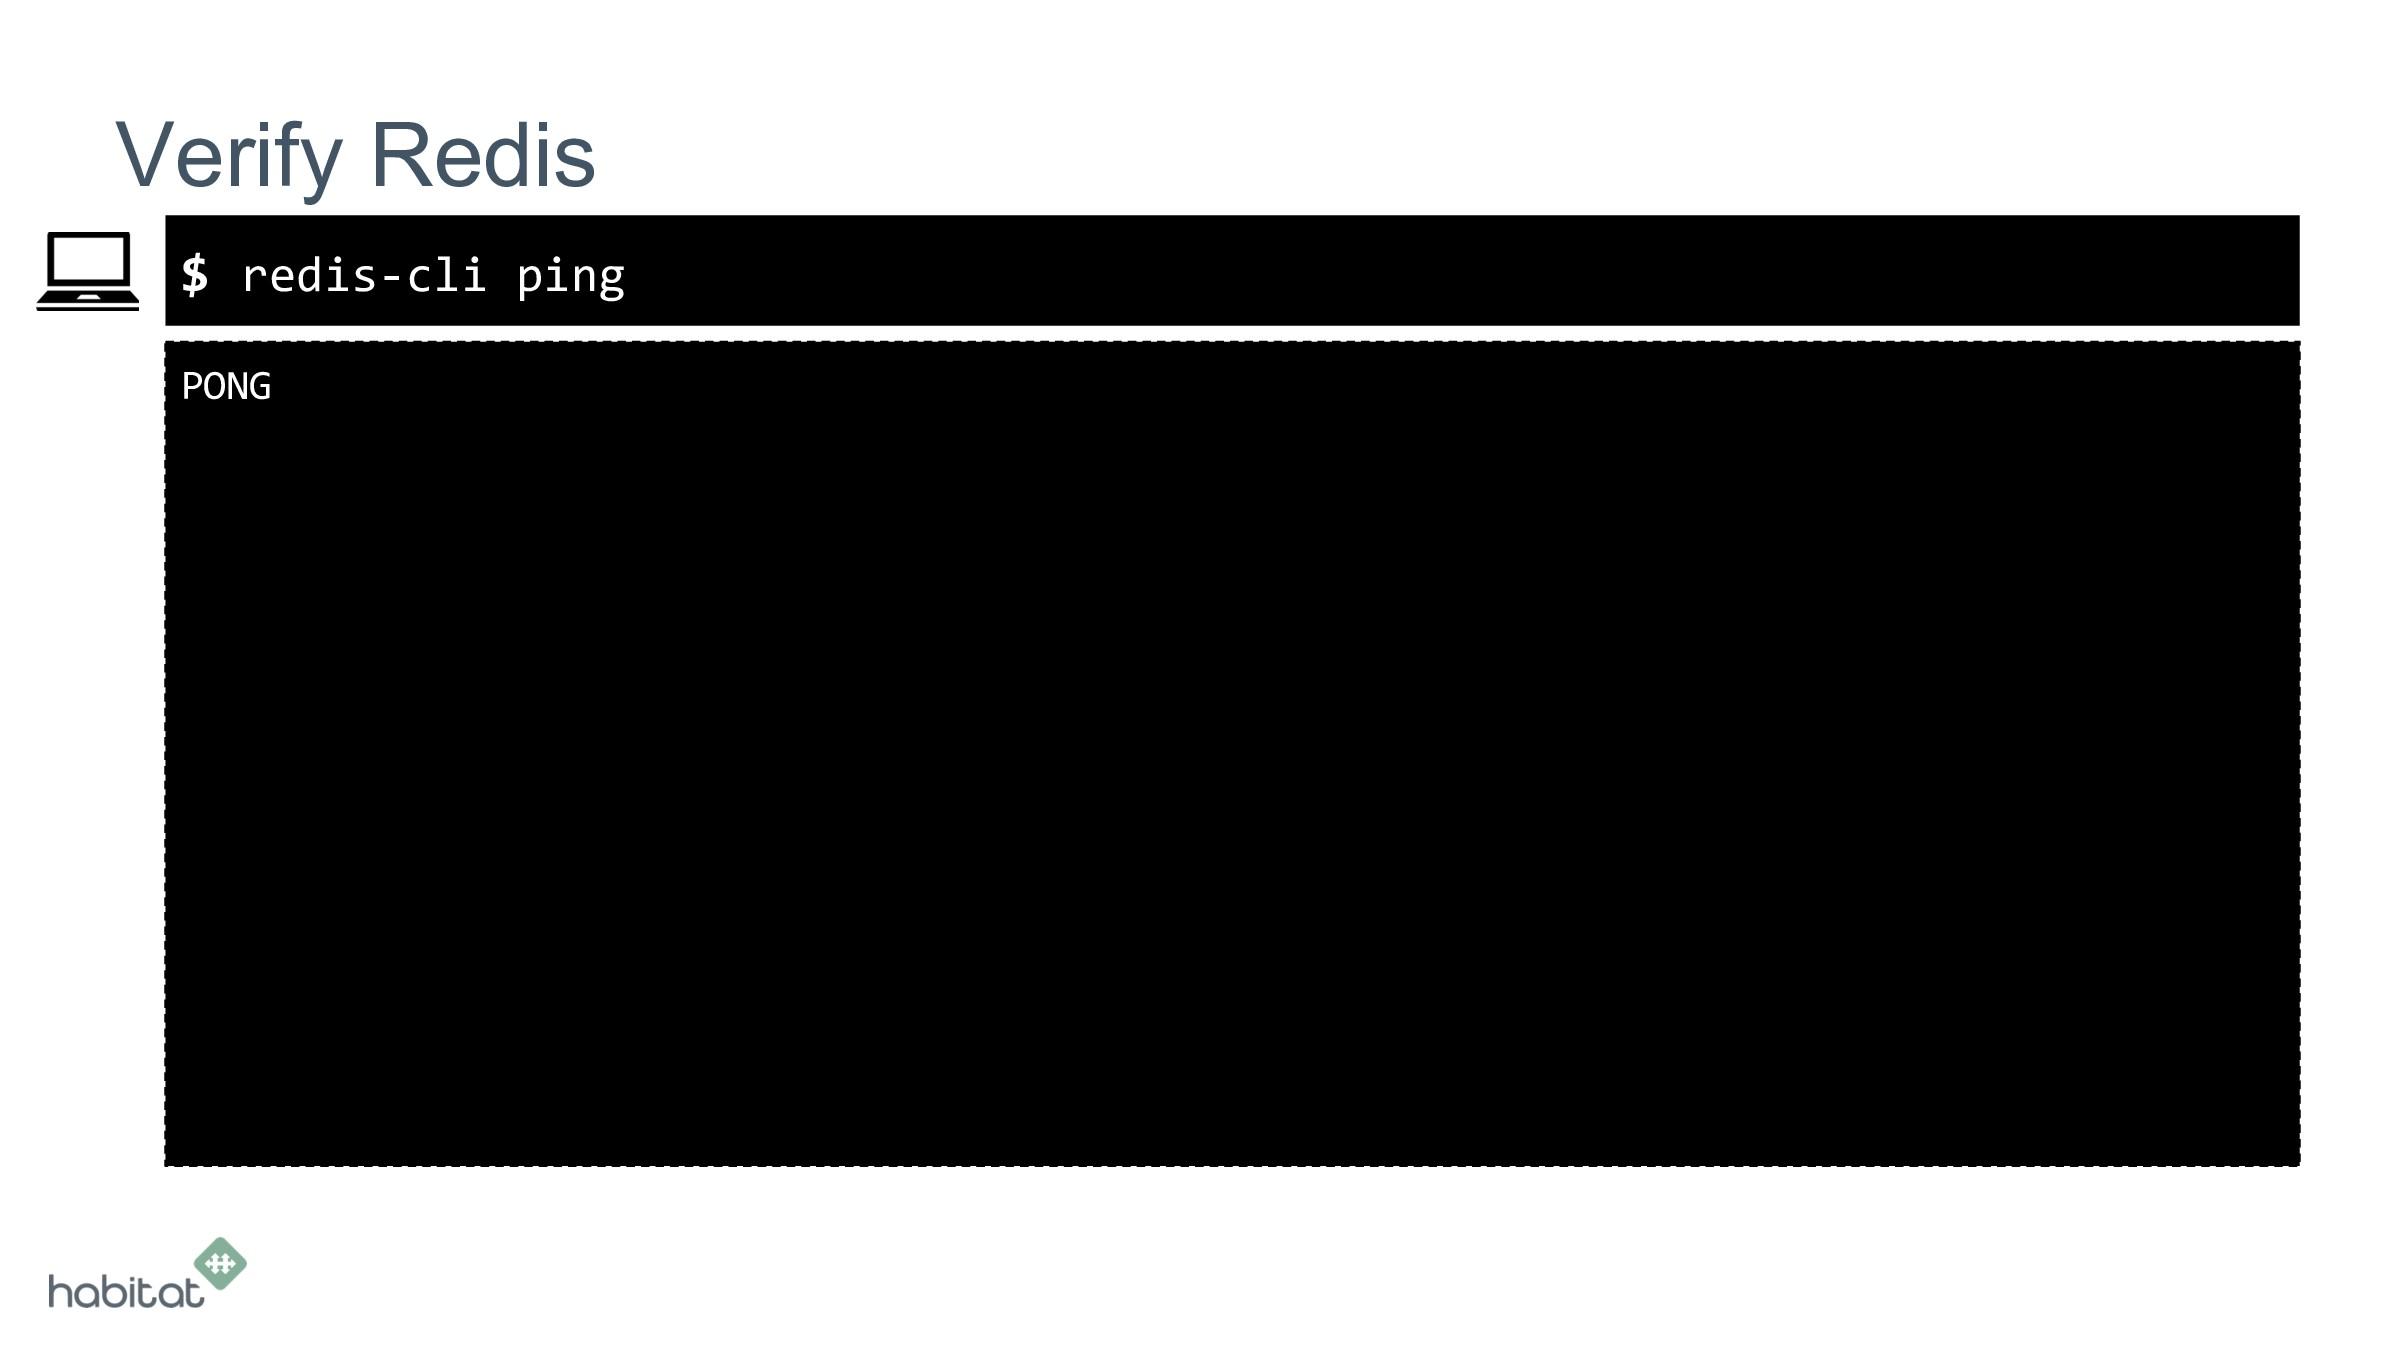 $ PONG Verify Redis redis-cli ping